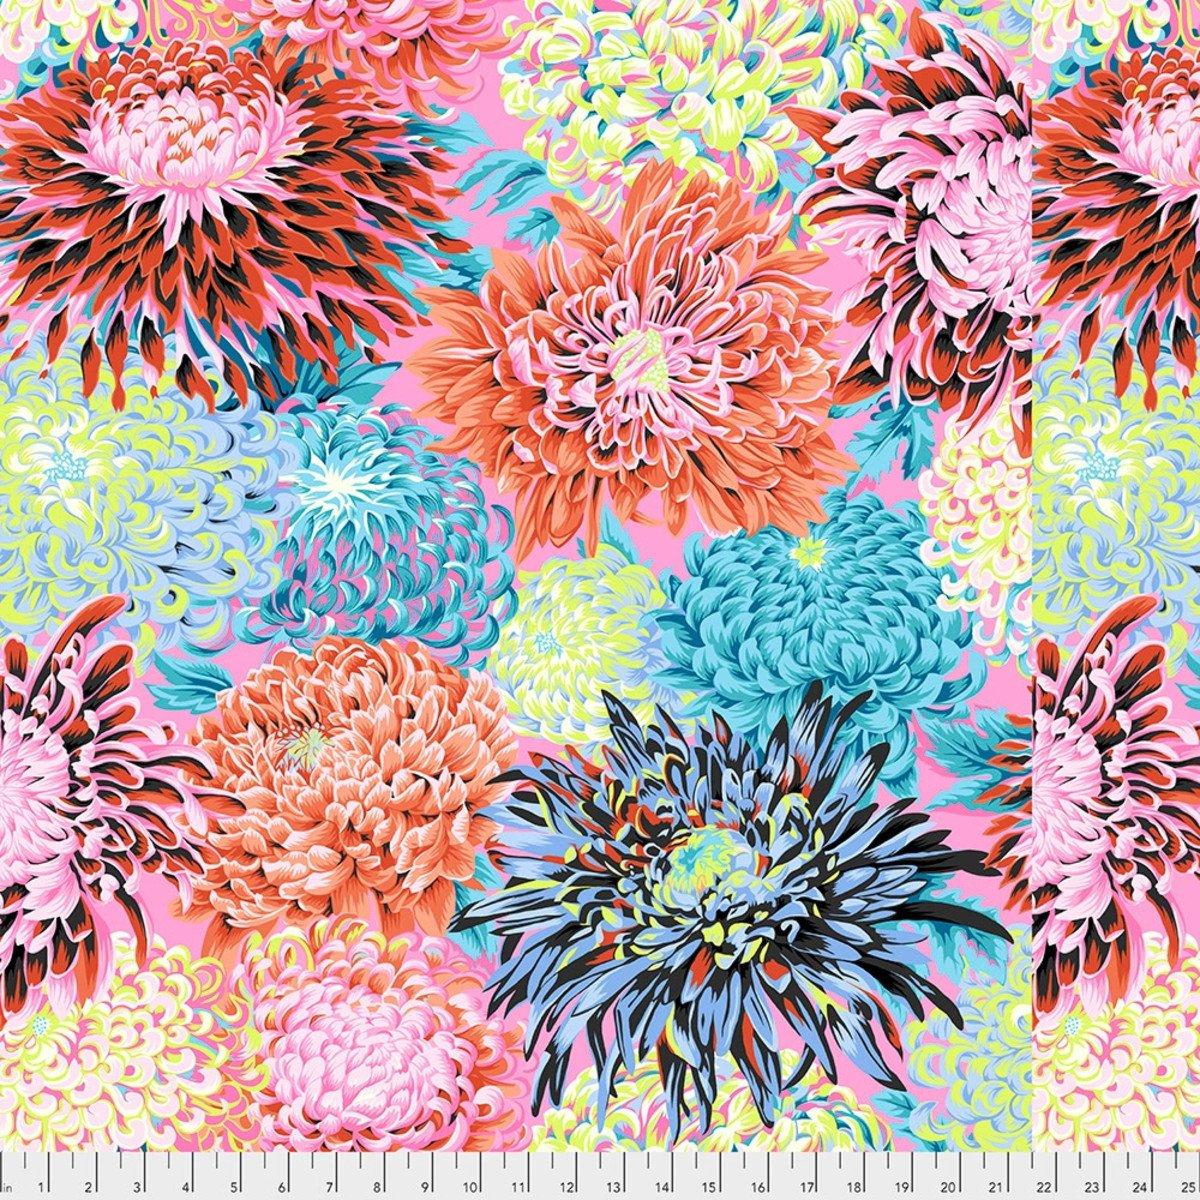 Kaffe Fassett, Japanese Chrysanthemum, Contrast